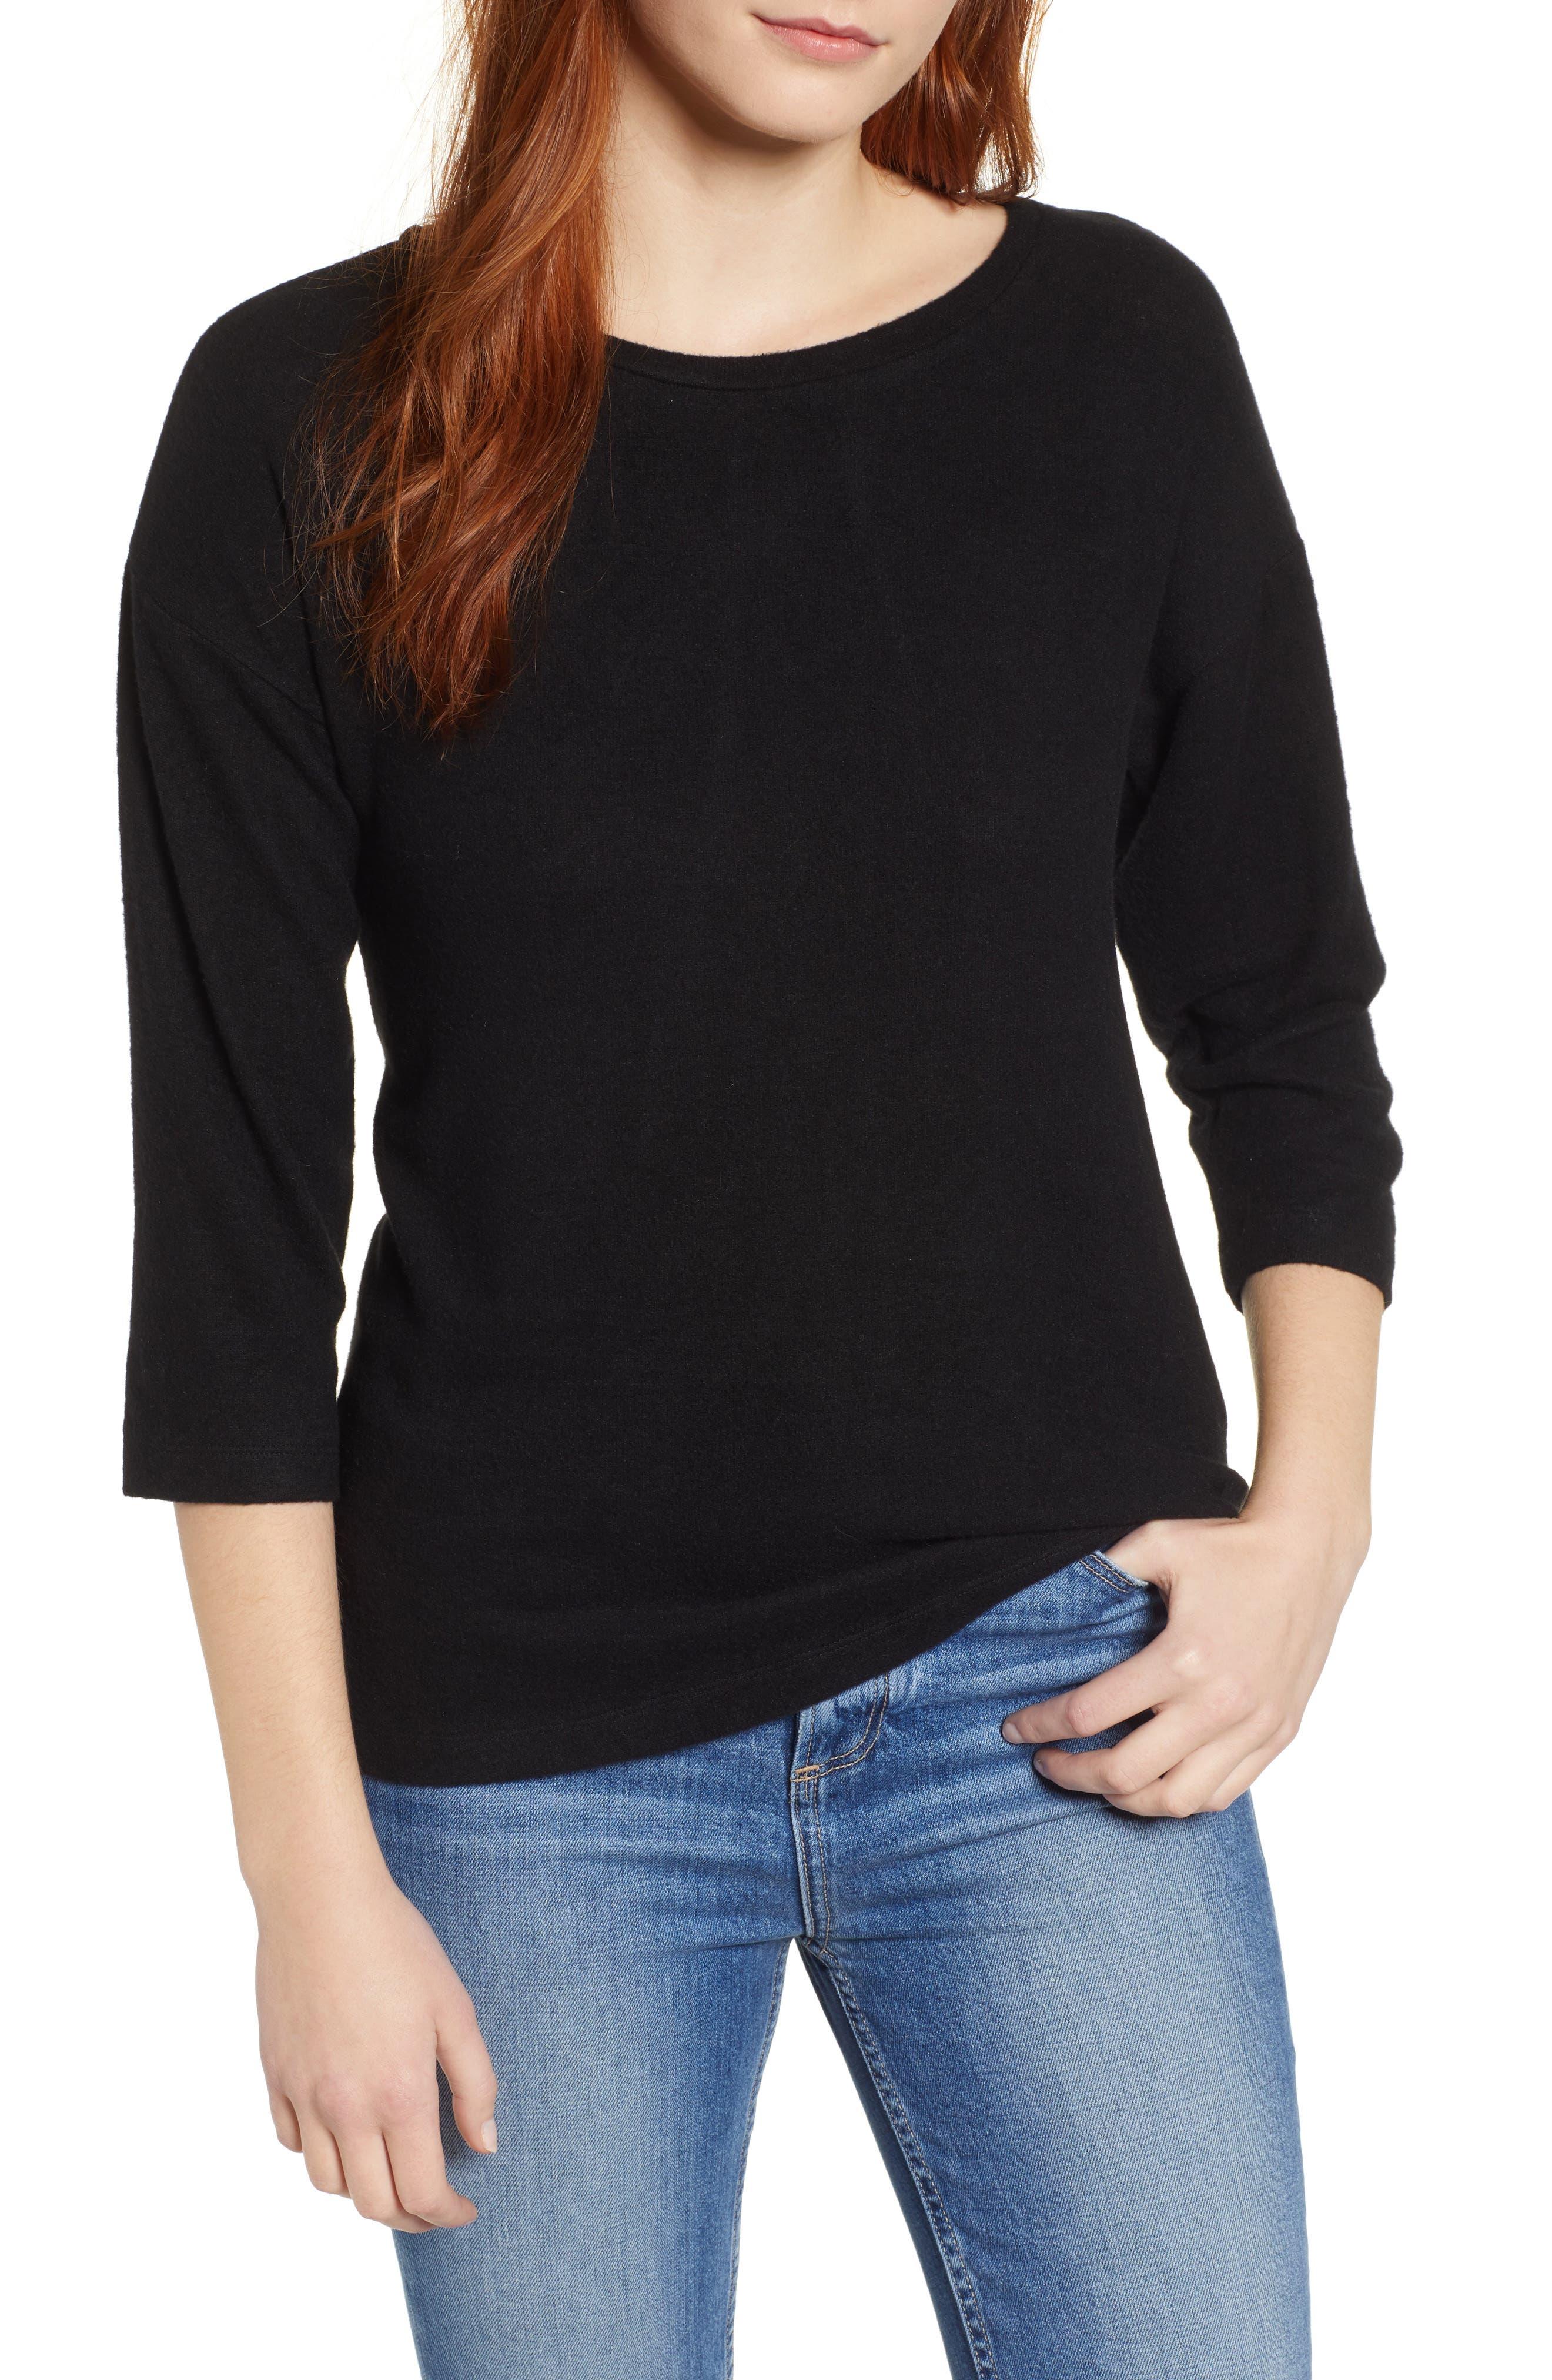 BOBEAU Pleat Back Pullover, Main, color, 001